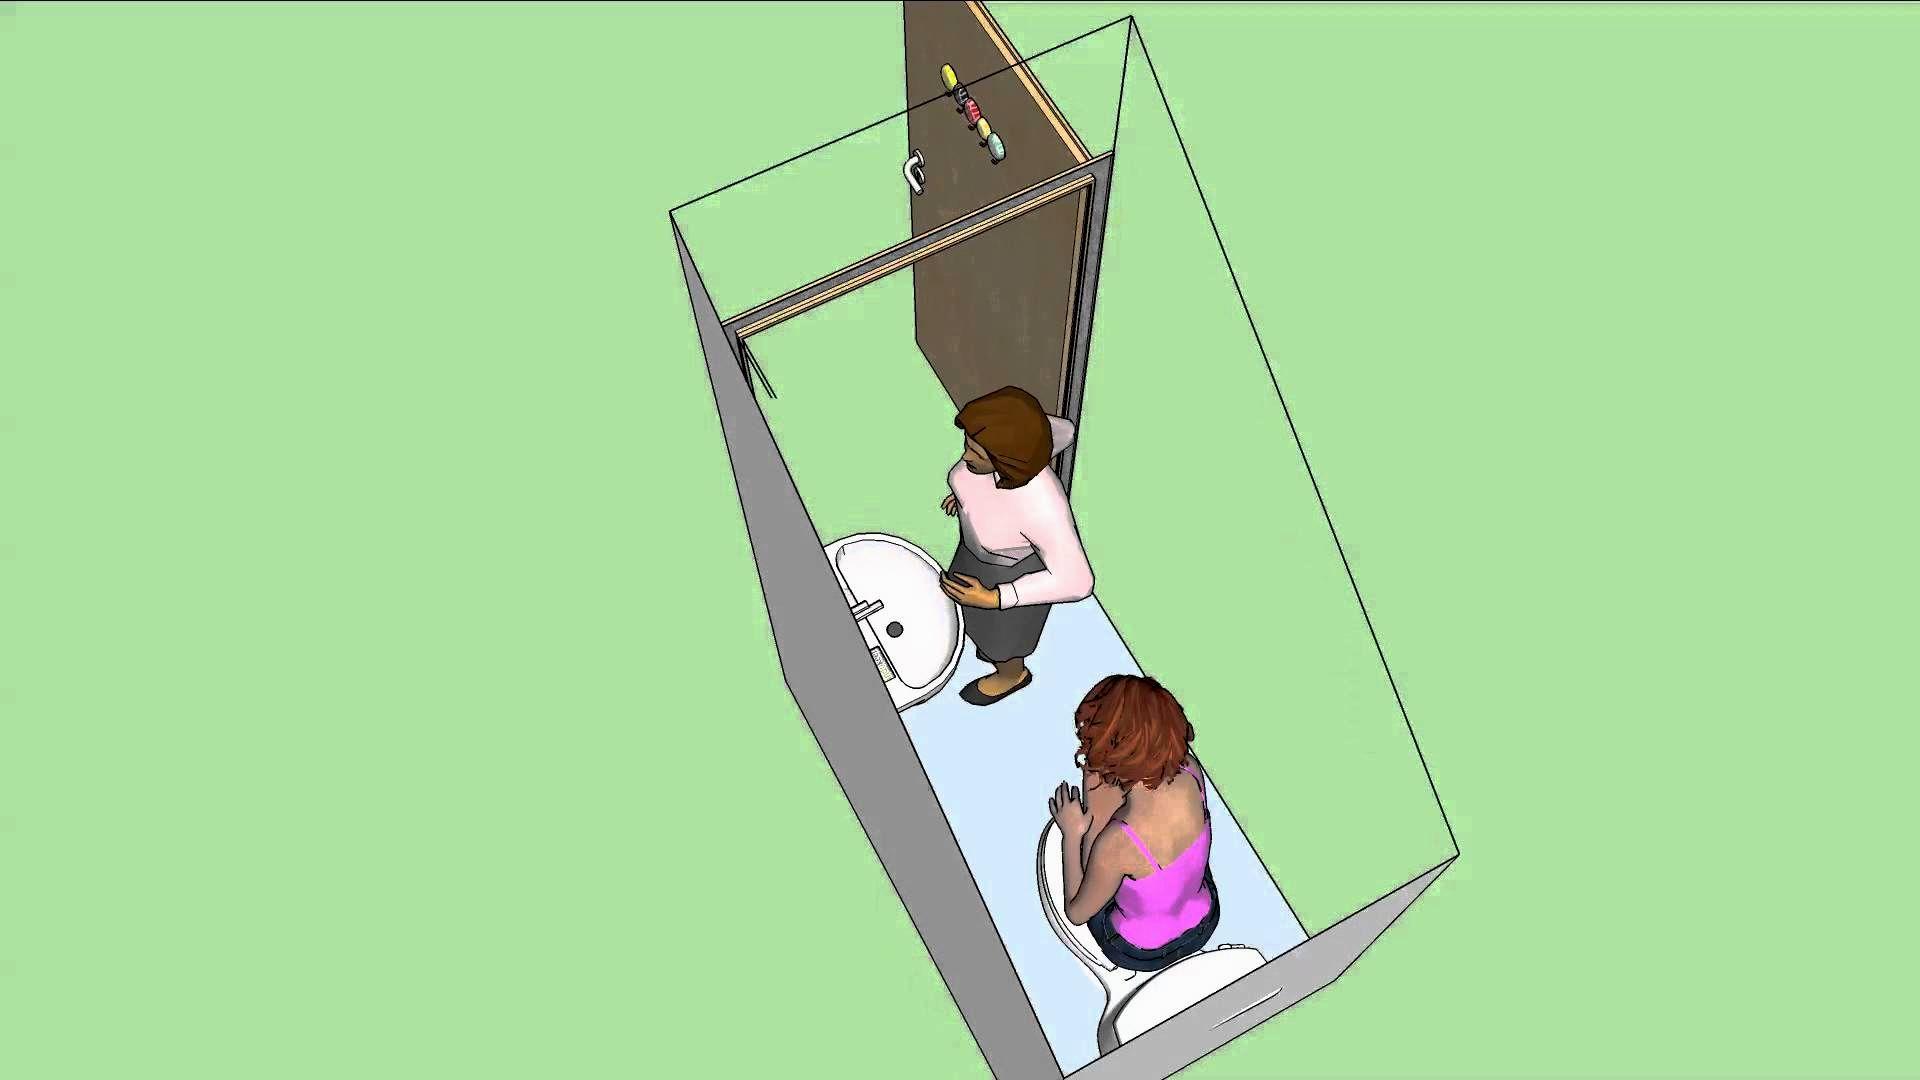 finest kids bathroom ideas picture-Excellent Kids Bathroom Ideas Inspiration